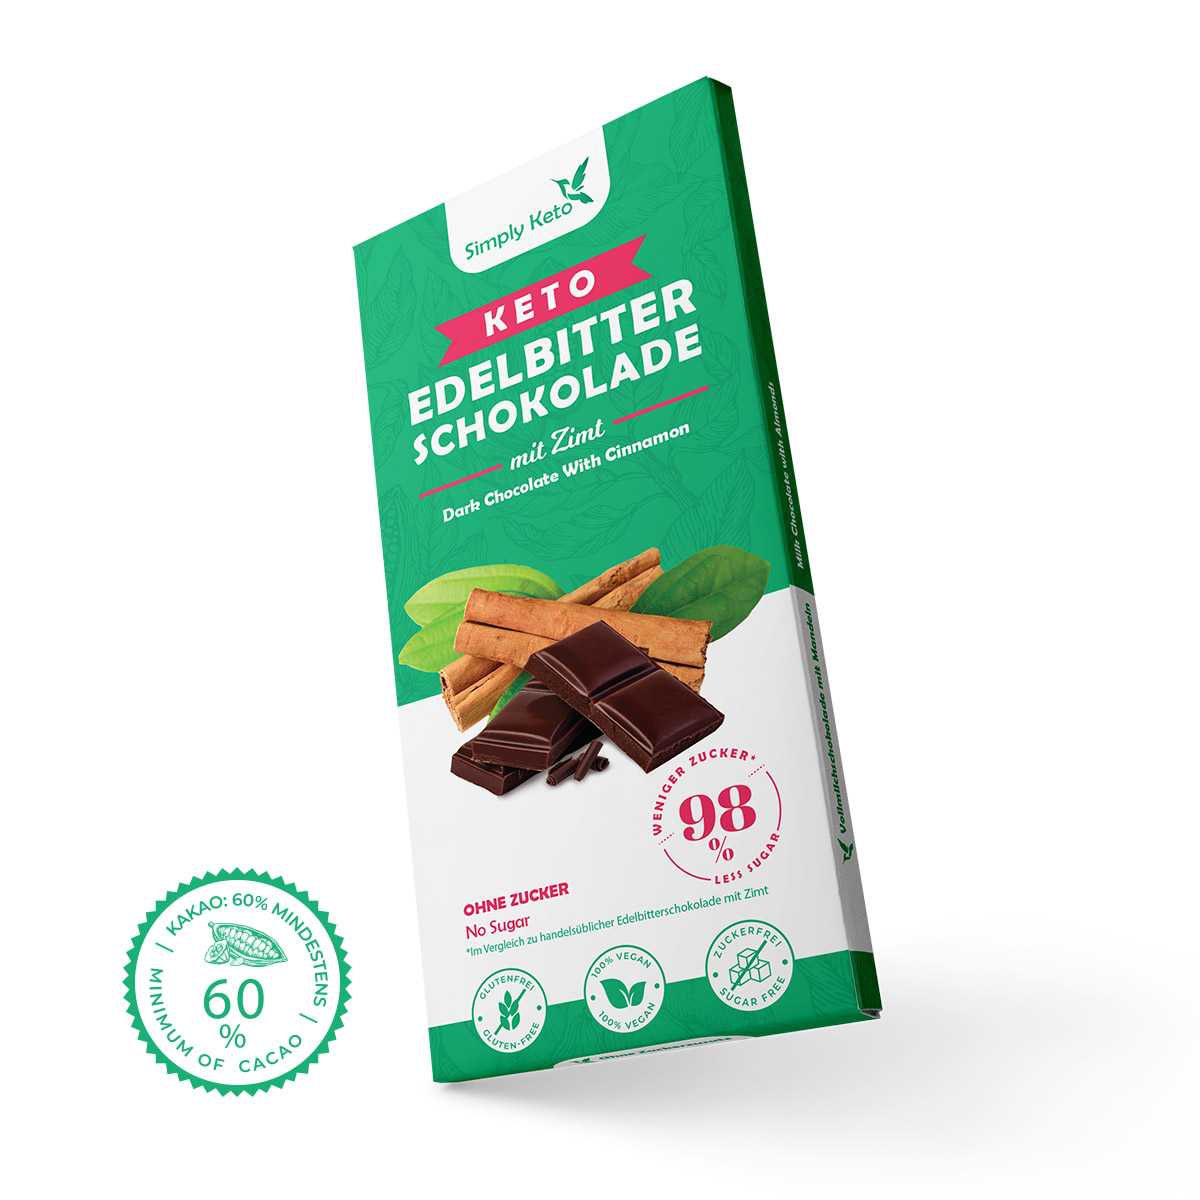 Keto Edelbitter Schokolade mit Zimt   8 Kakao